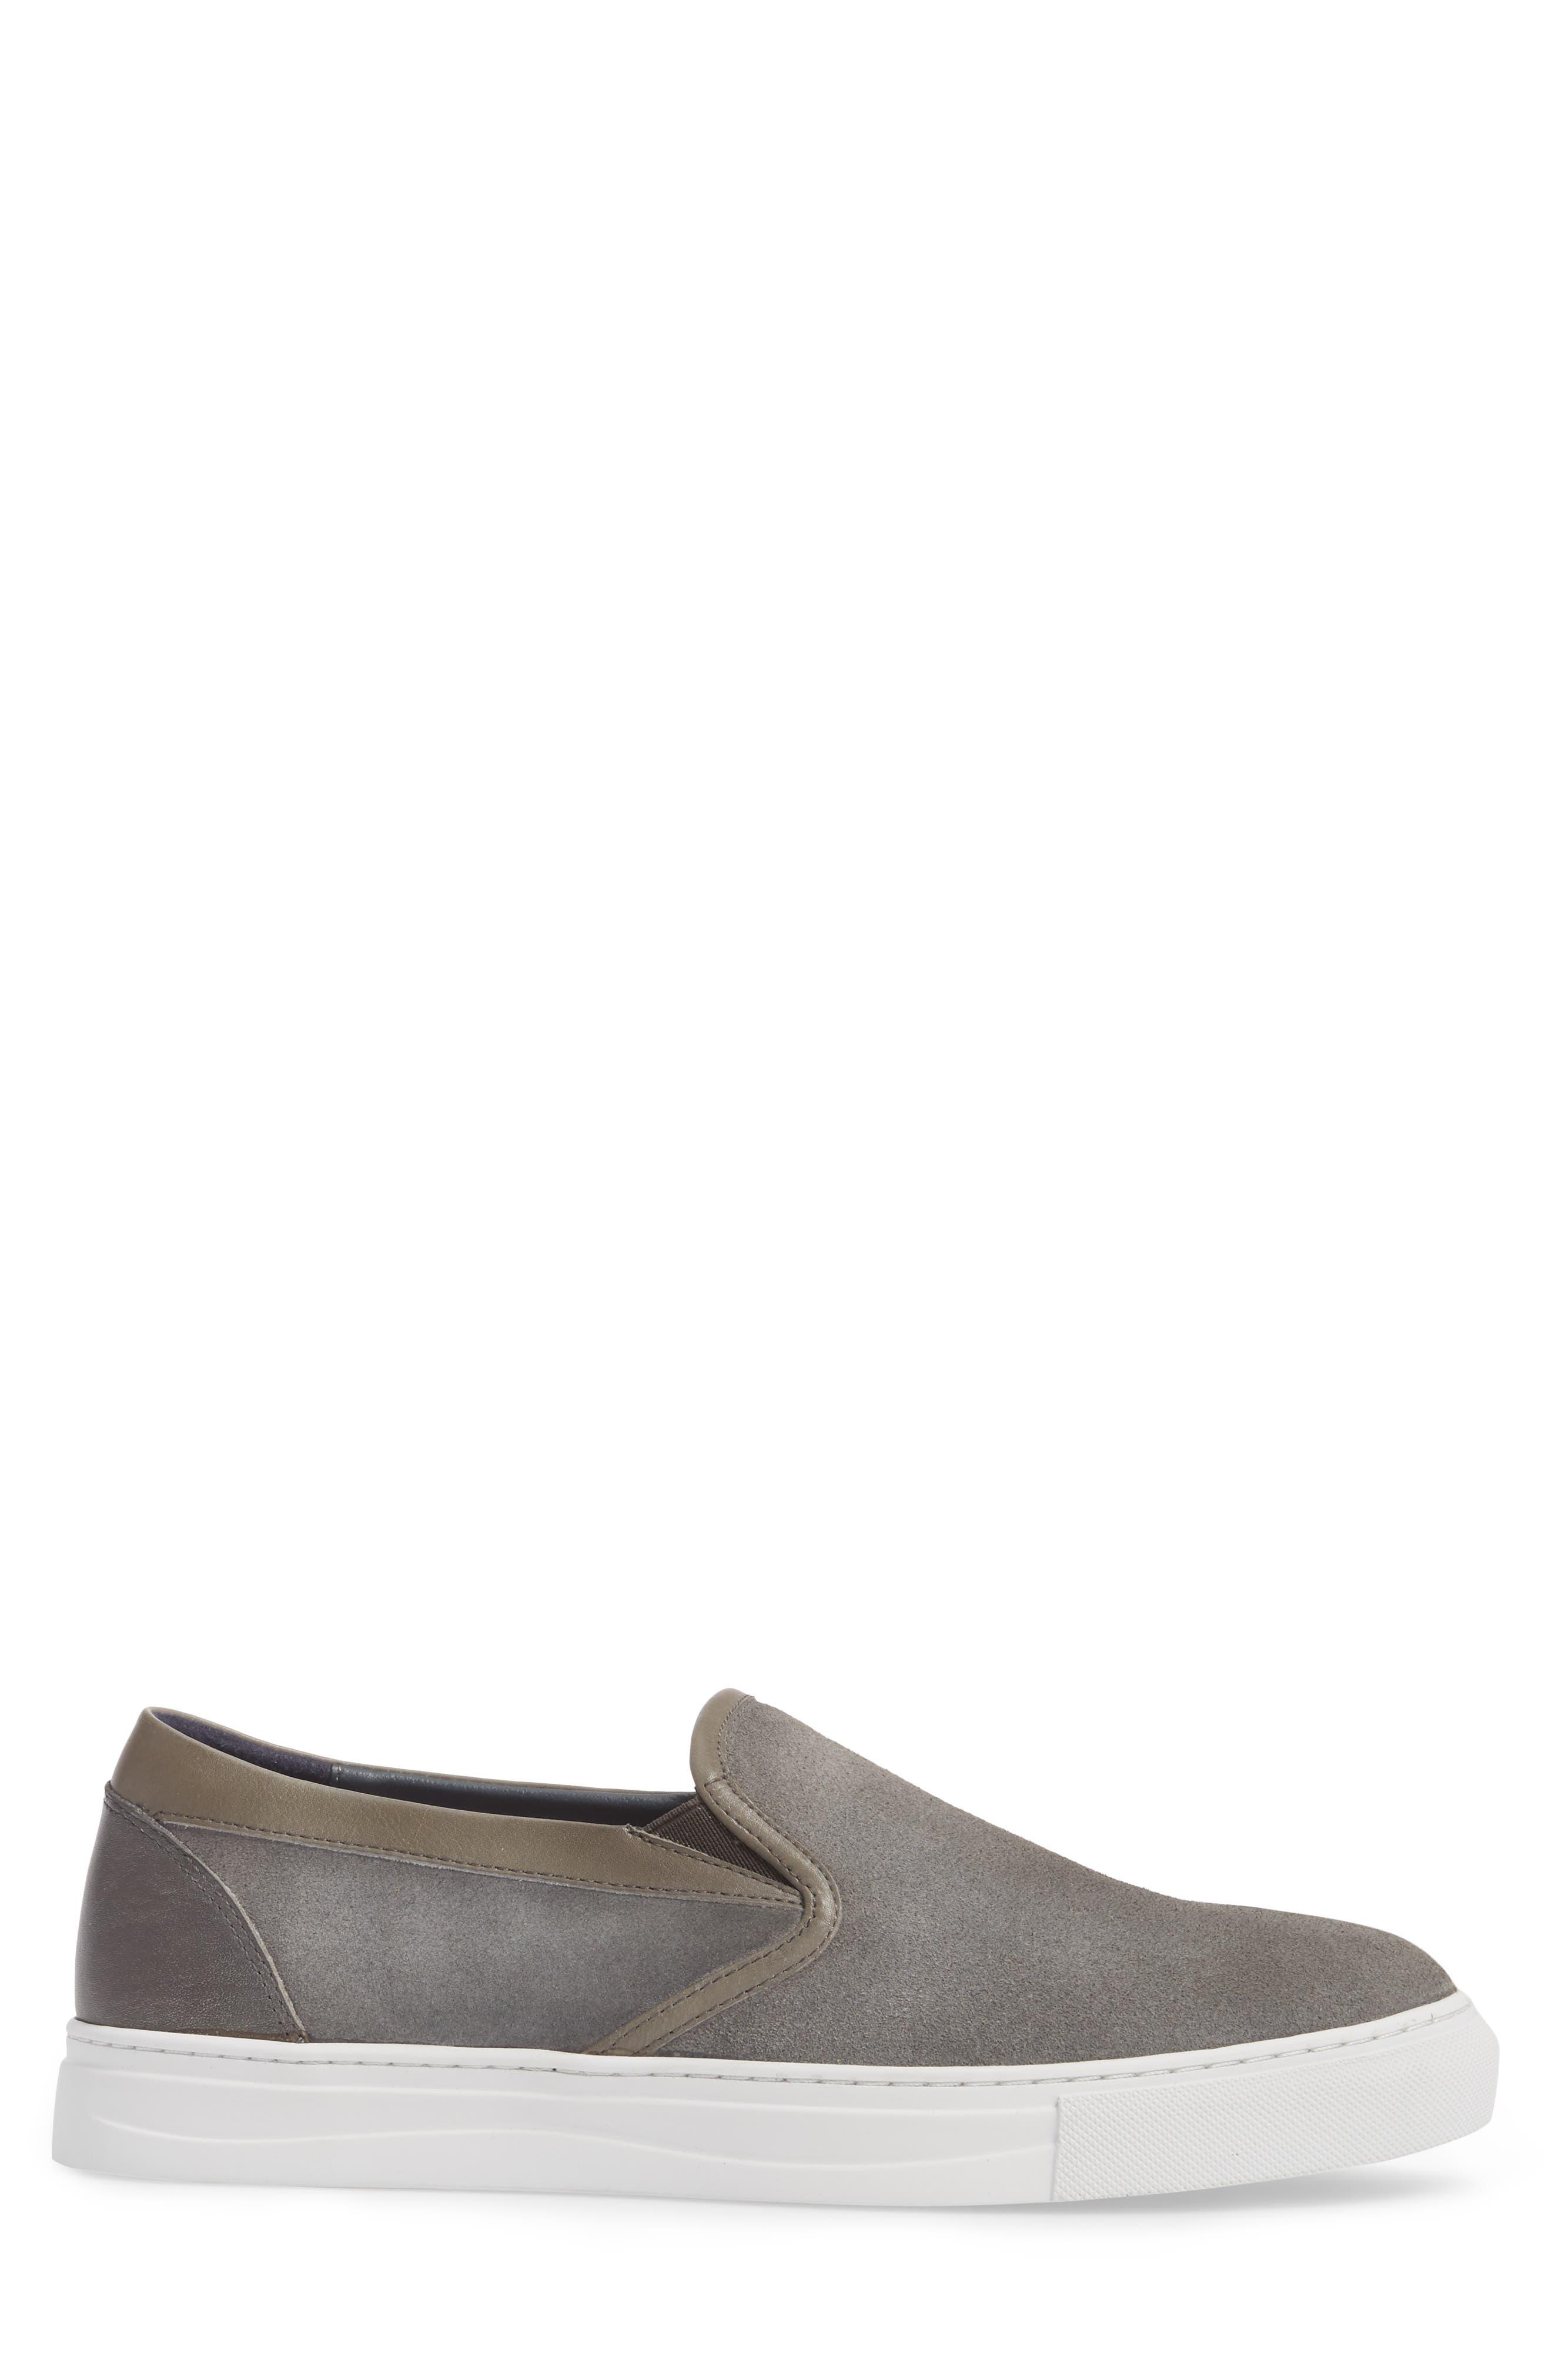 Vane Slip-On Sneaker,                             Alternate thumbnail 3, color,                             Grey Suede/ Leather